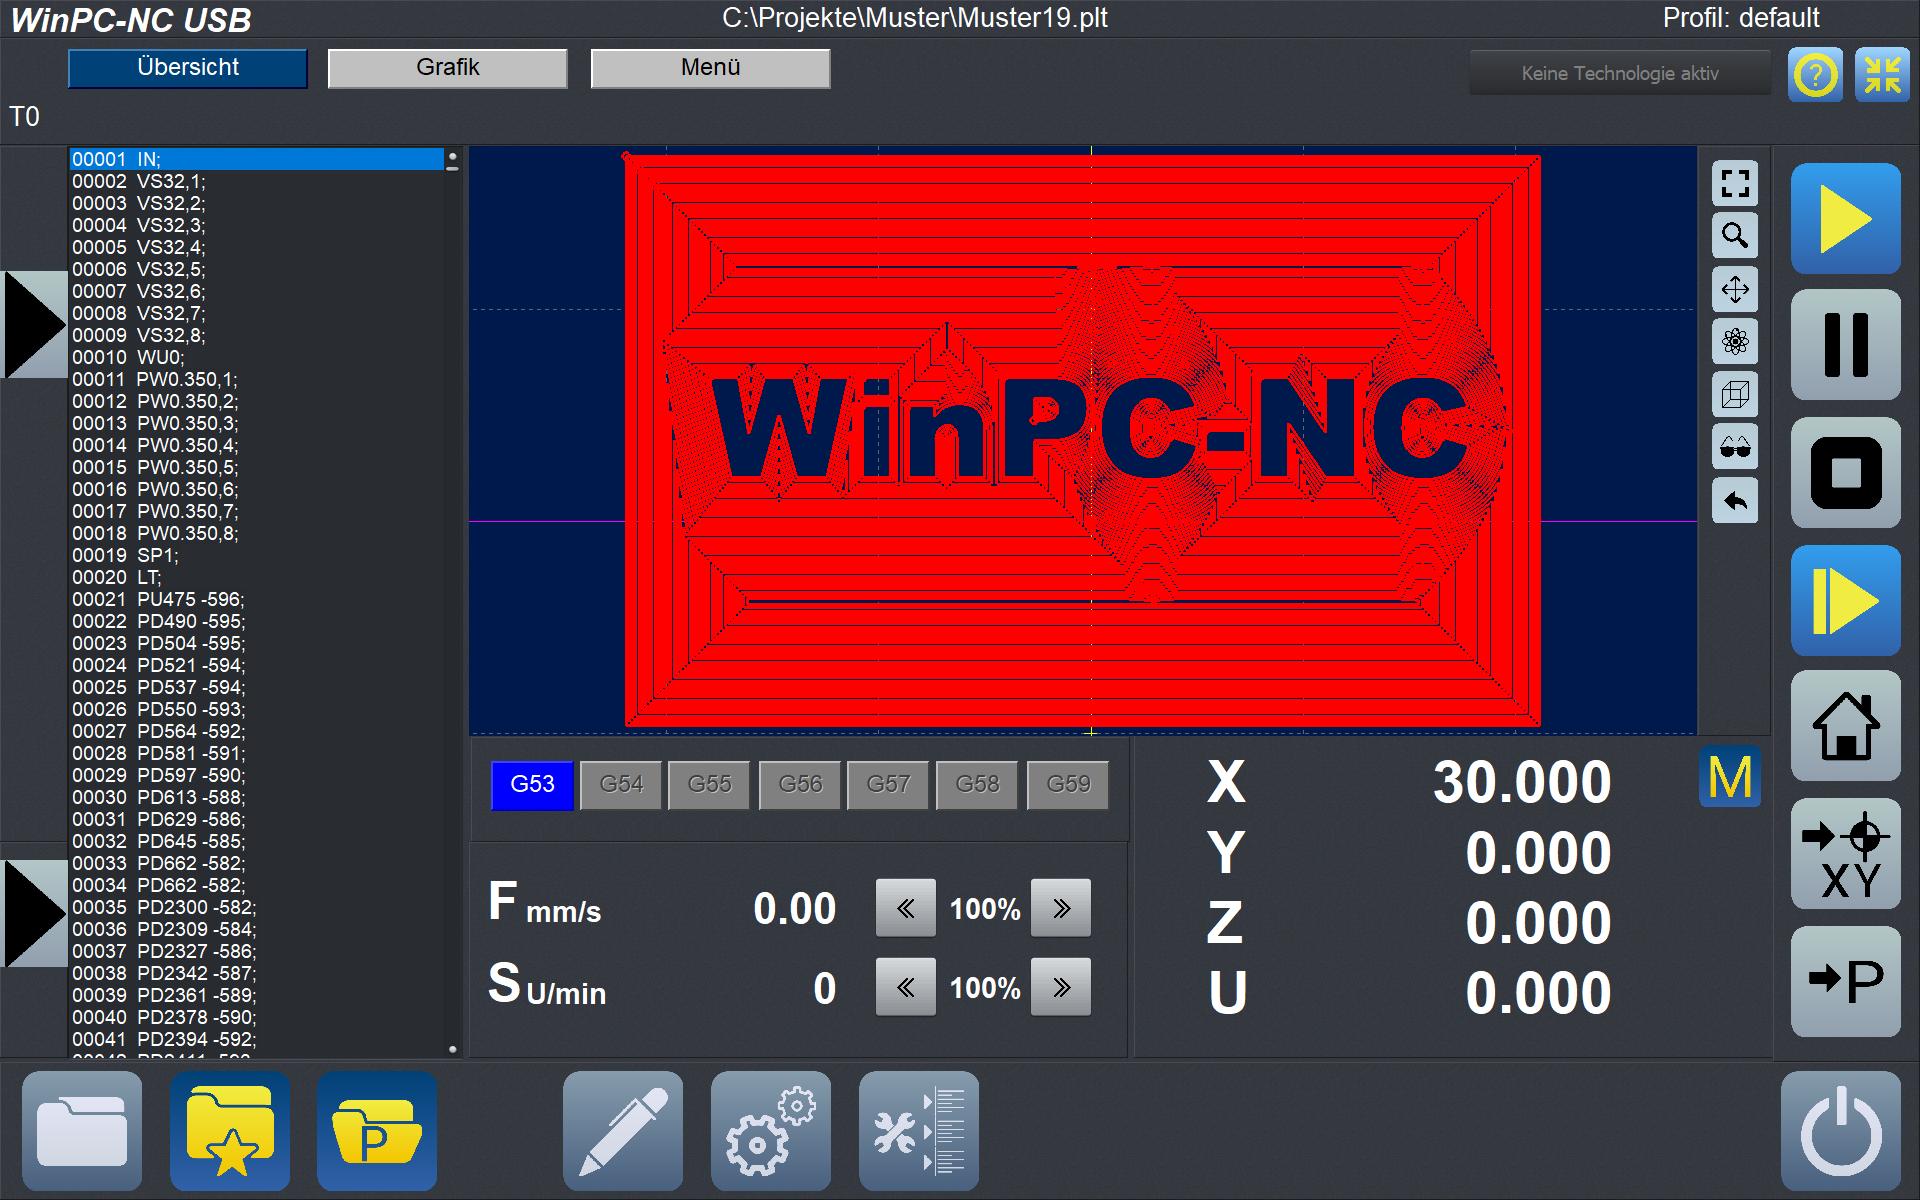 WinPC-NC Update auf Version 4.x